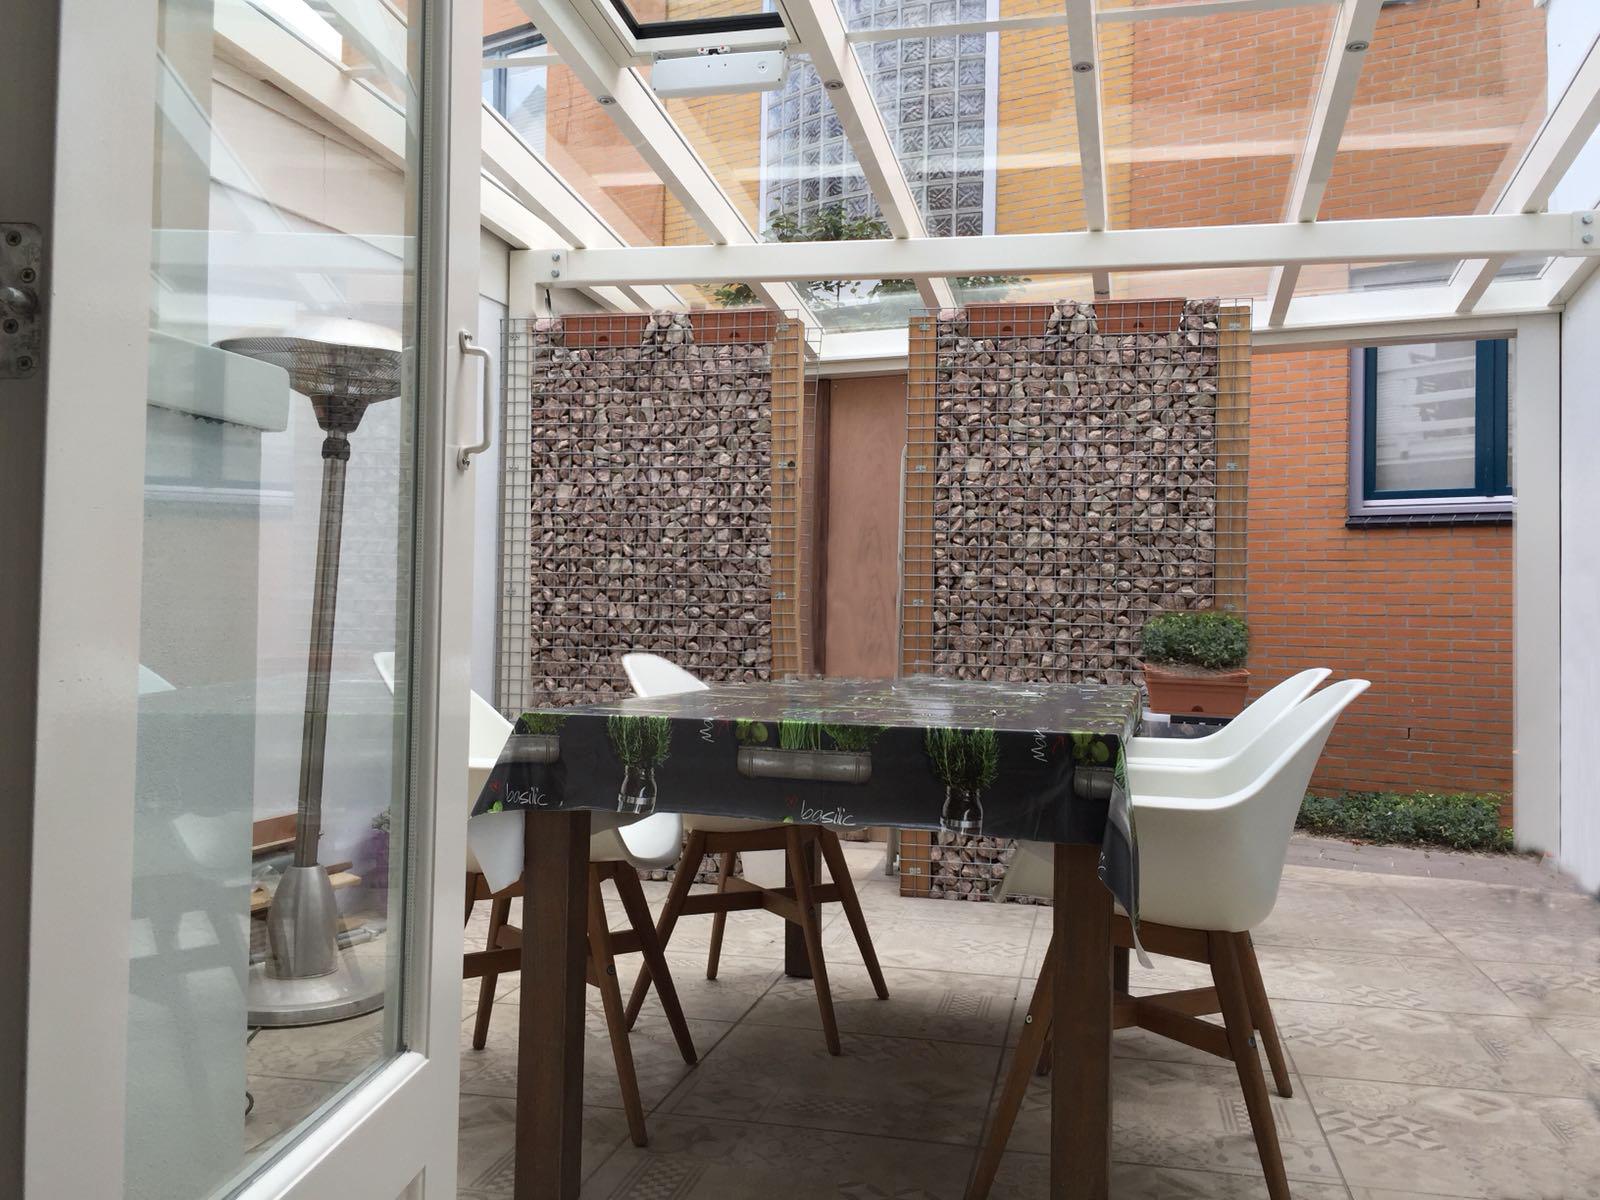 Terrasoverkapping patio